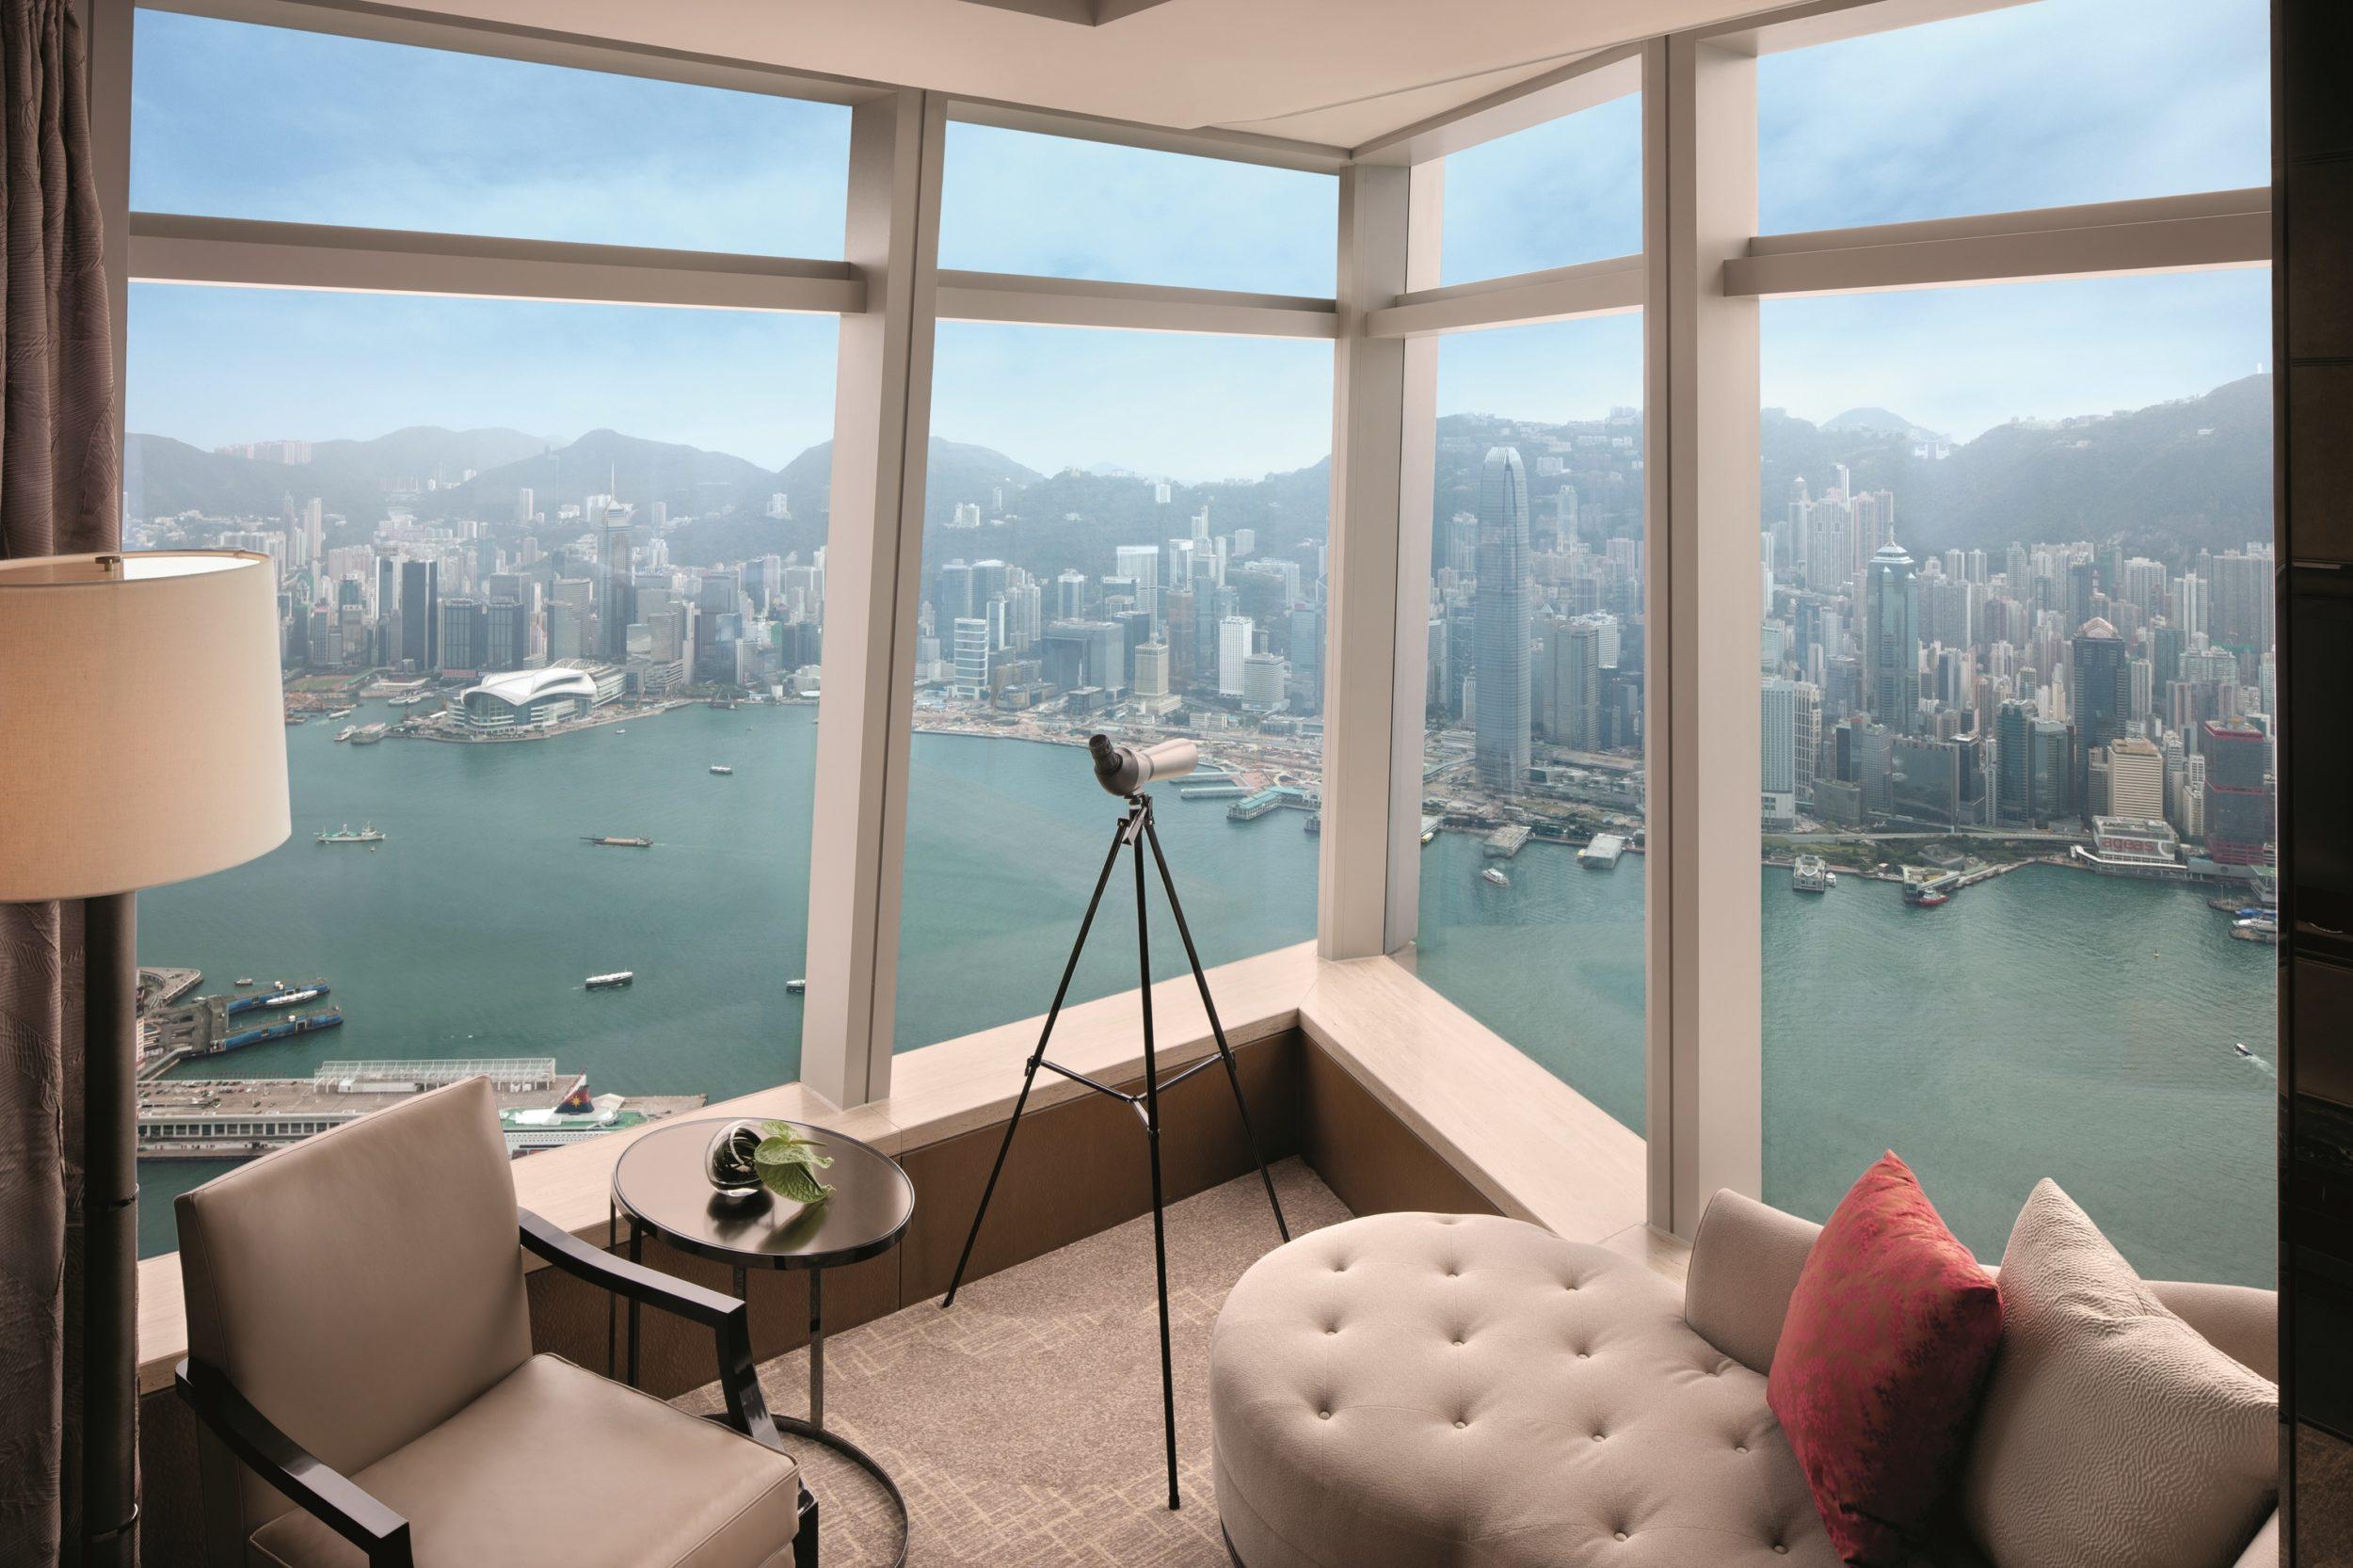 Best hotels in Hong Kong: The Ritz-Carlton